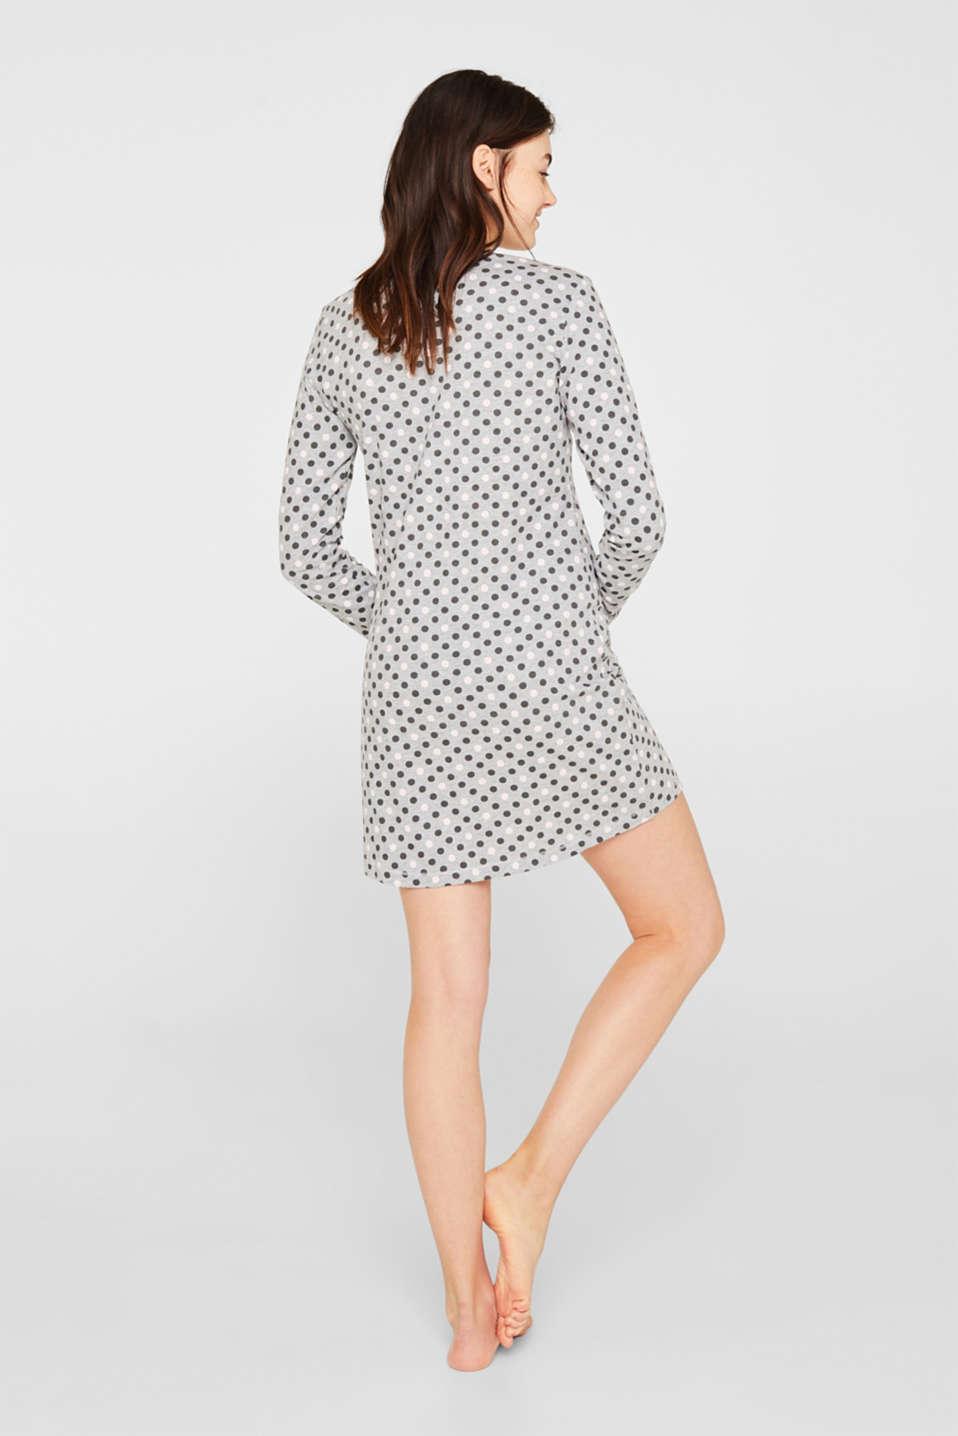 Jersey nightdress with polka dot print, MEDIUM GREY, detail image number 1